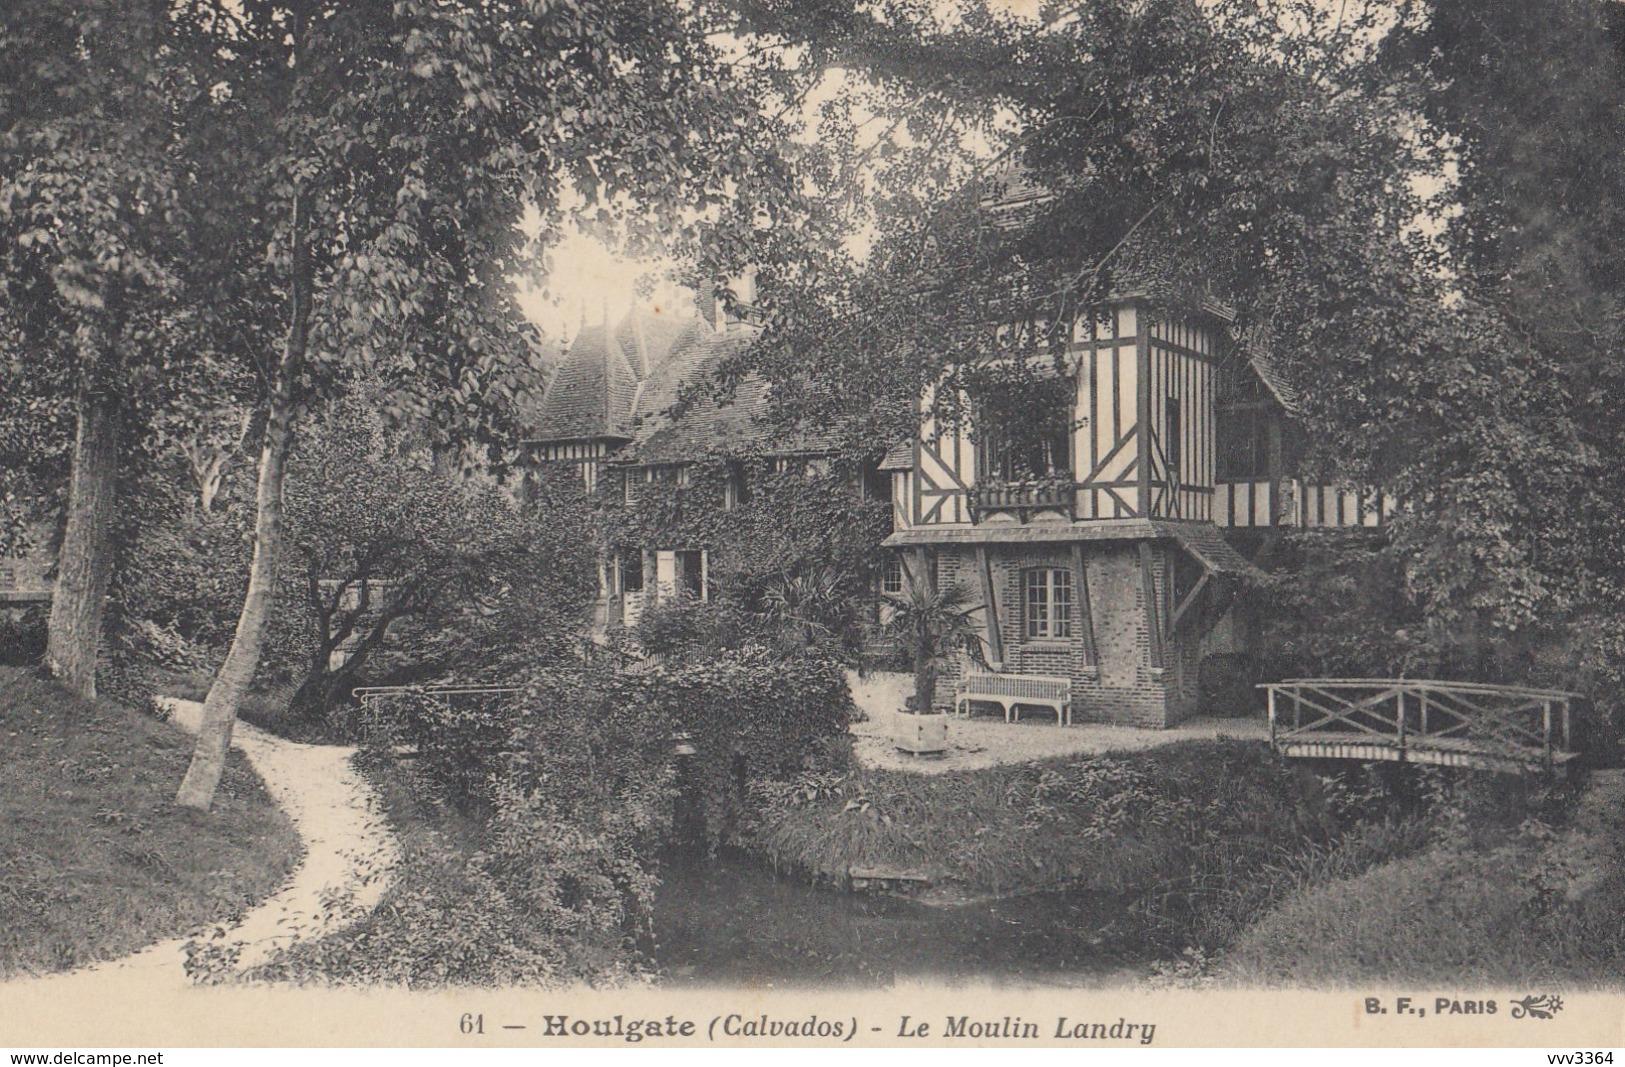 HOULGATE (Calvados): Le Moulin Landry - Houlgate